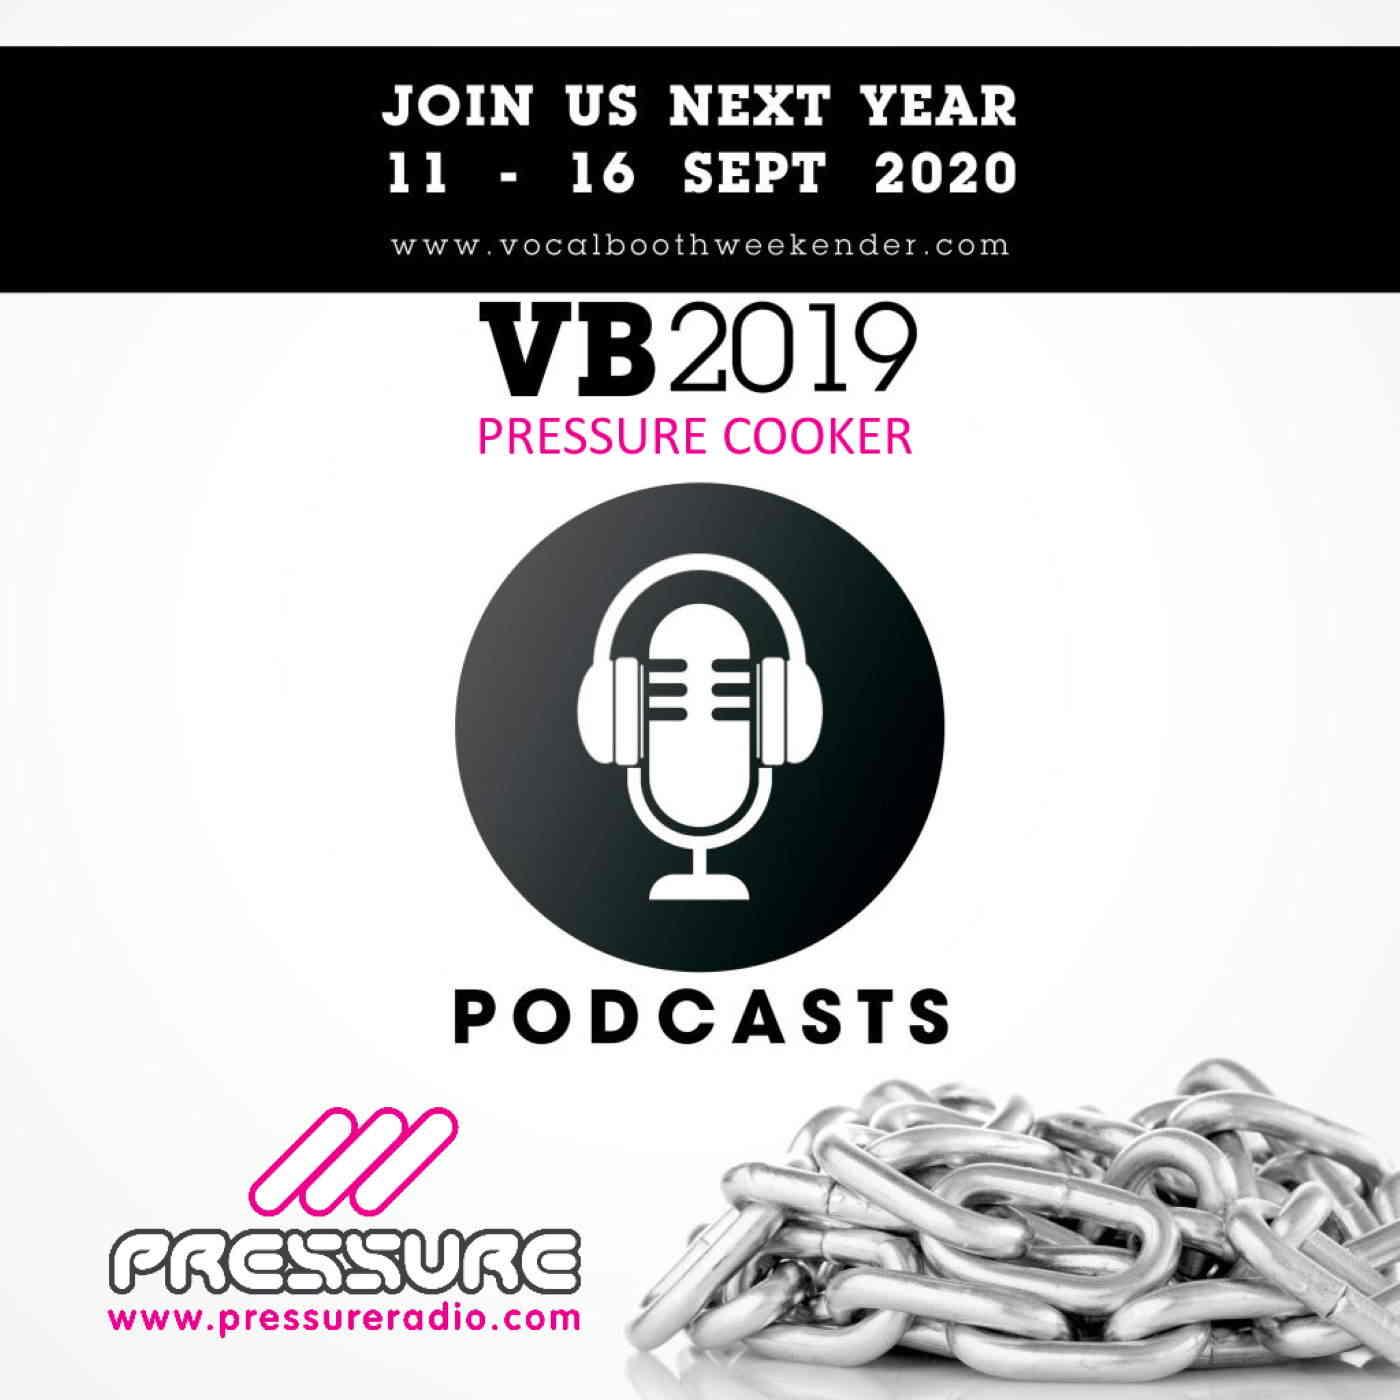 pressure cooker-podcast – Pressure Radio